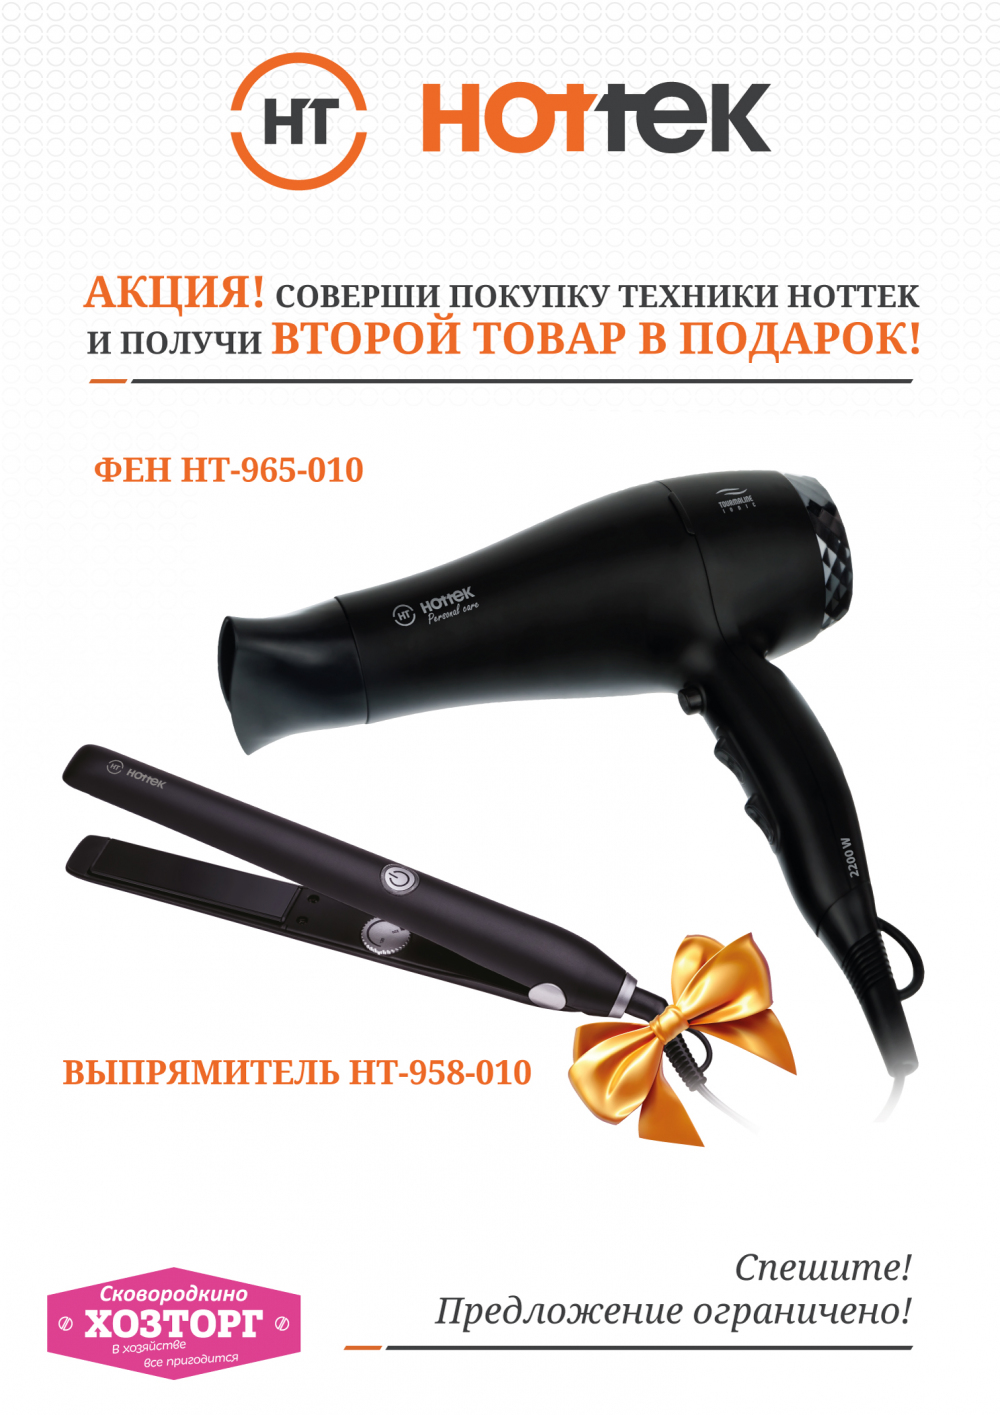 Комплект HOTTEK HT-958-010 щипцы + HT-965-010 фен